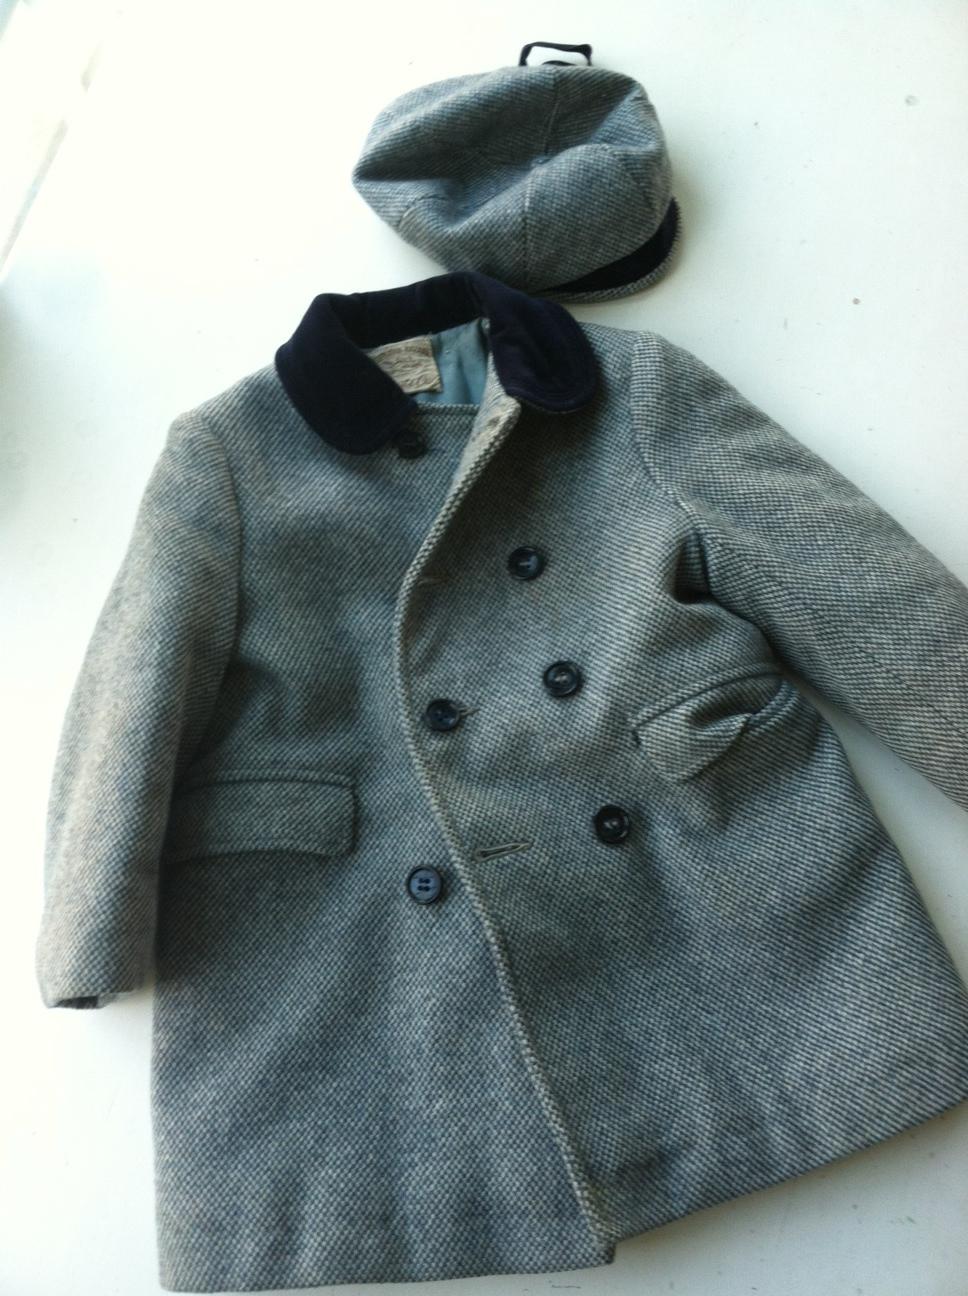 My Uncle Adam's overcoat from olden days.